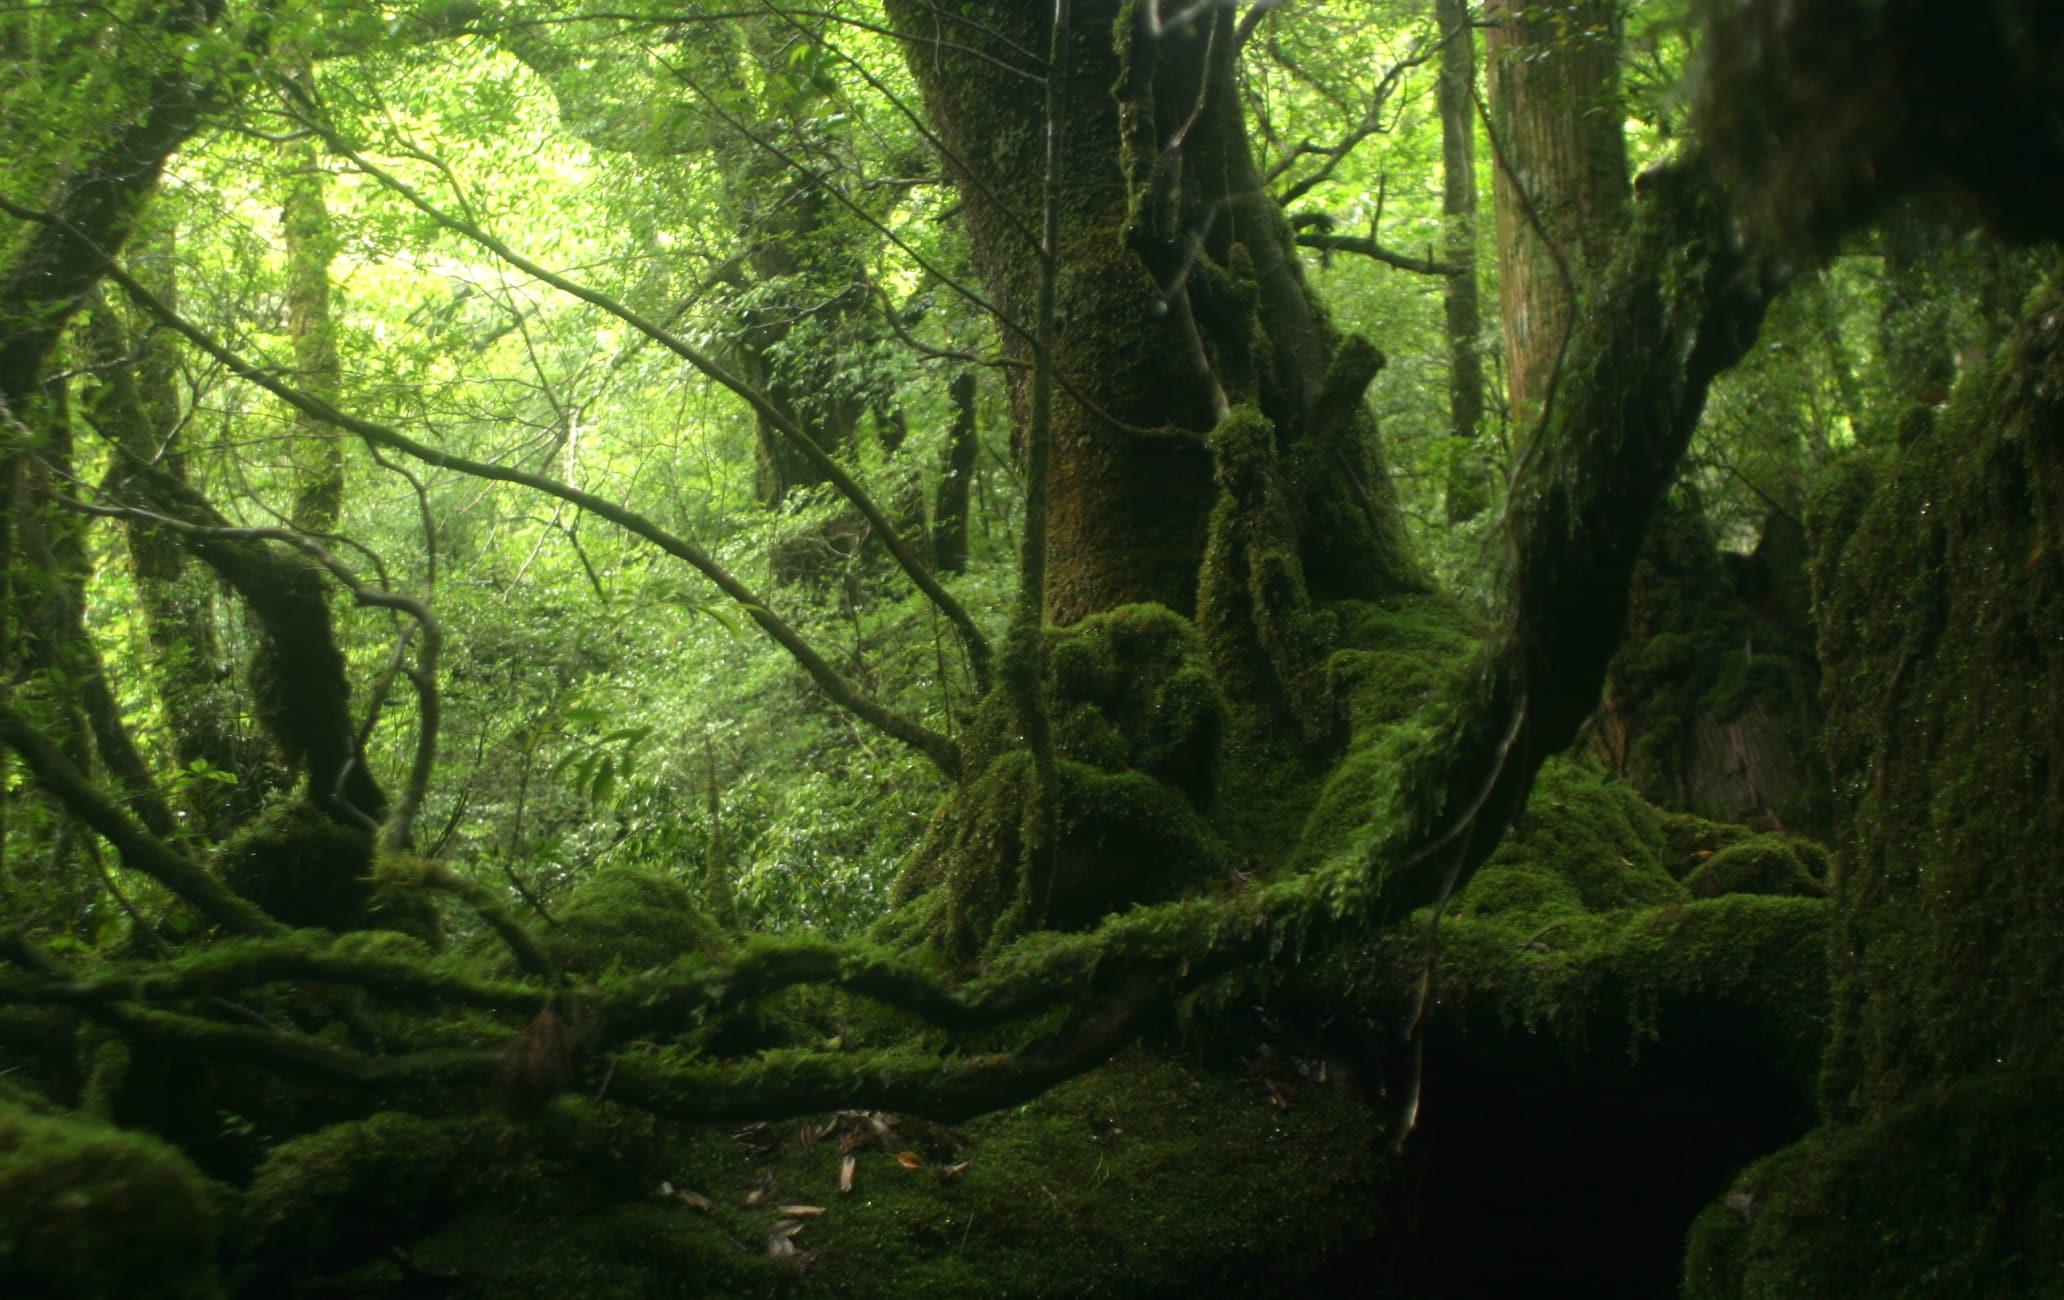 Iko-ji Teien Garden